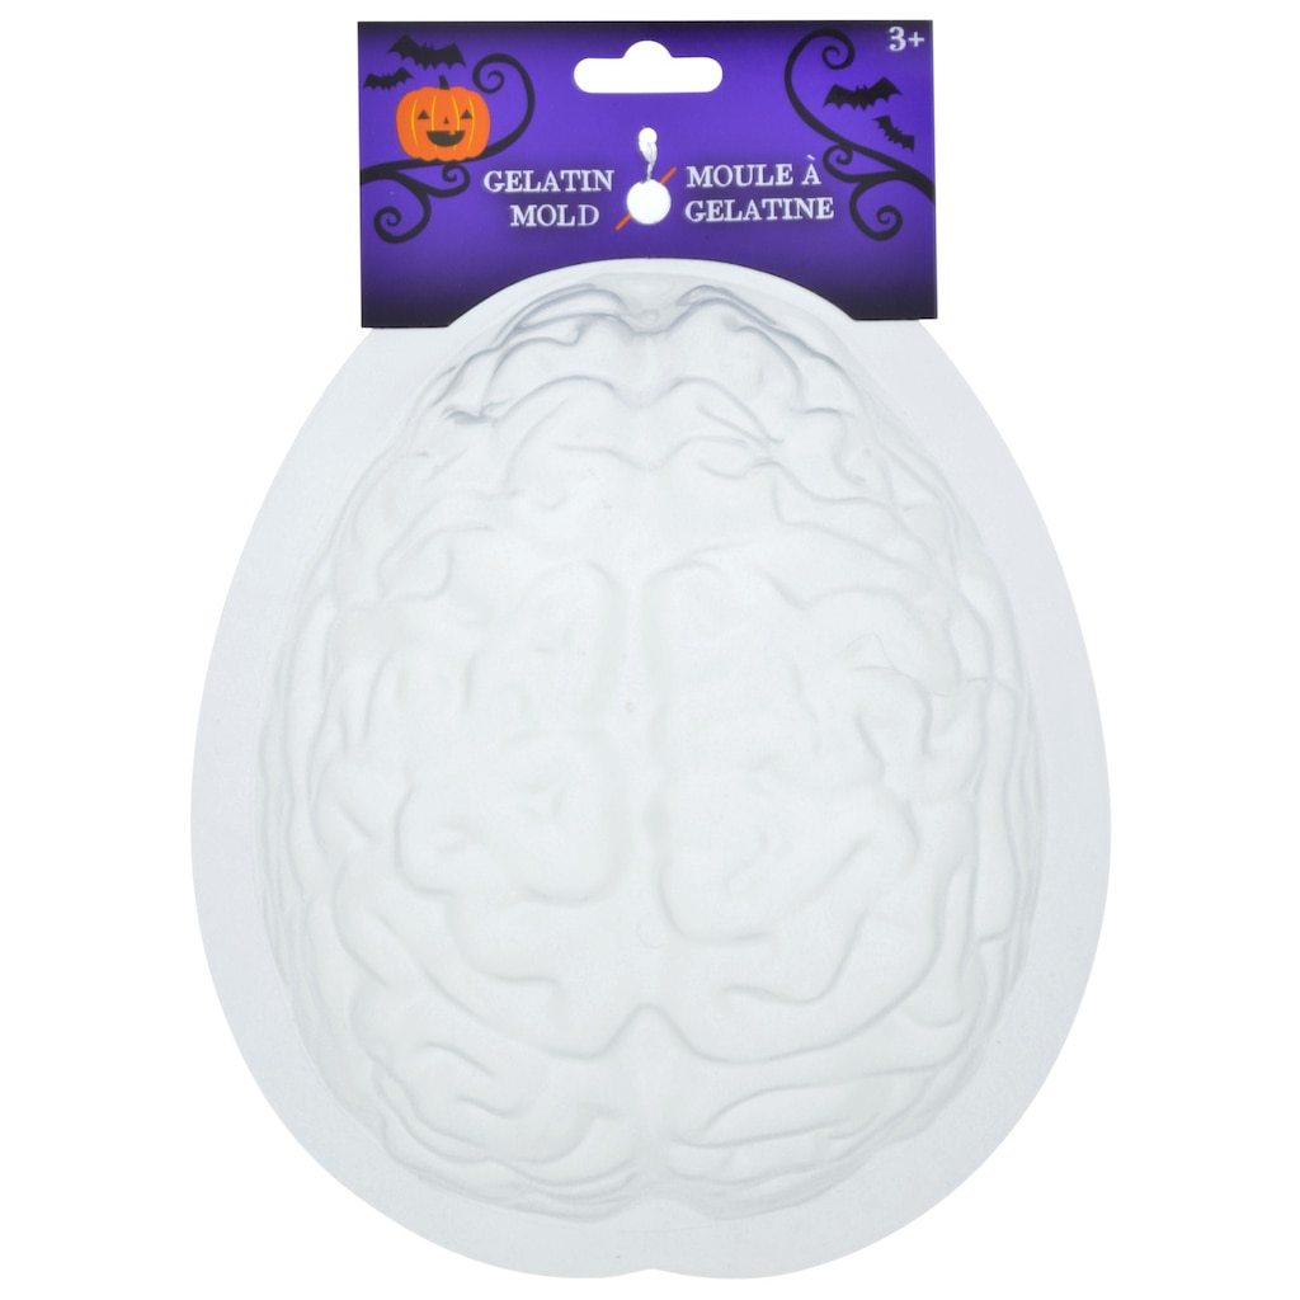 Brain-Shaped Gelatin Molds